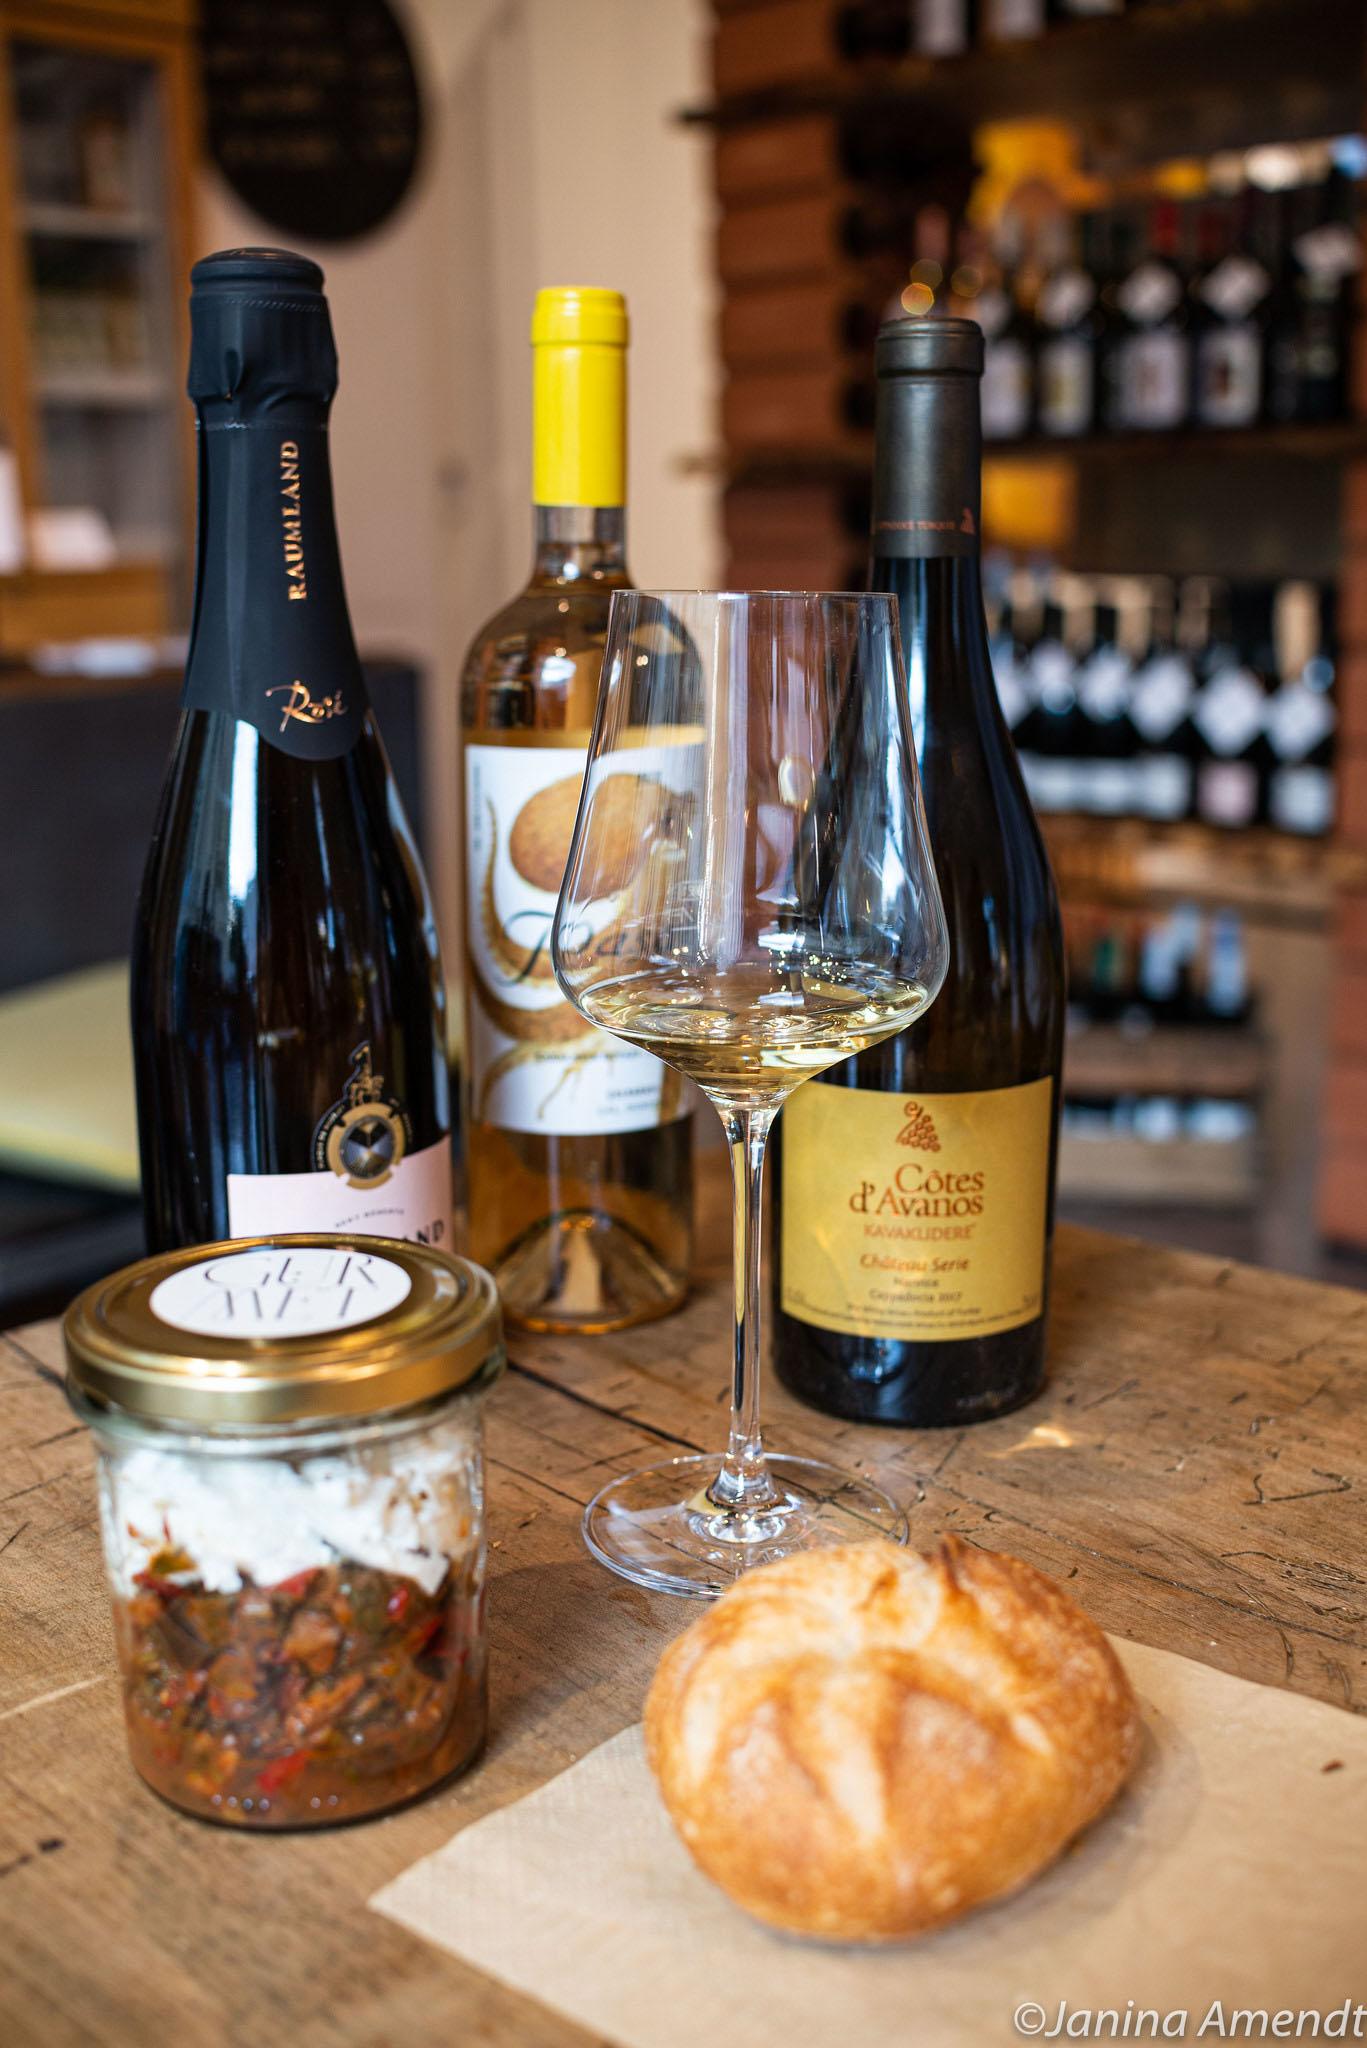 Gürmet Wein & Meze Pop Up